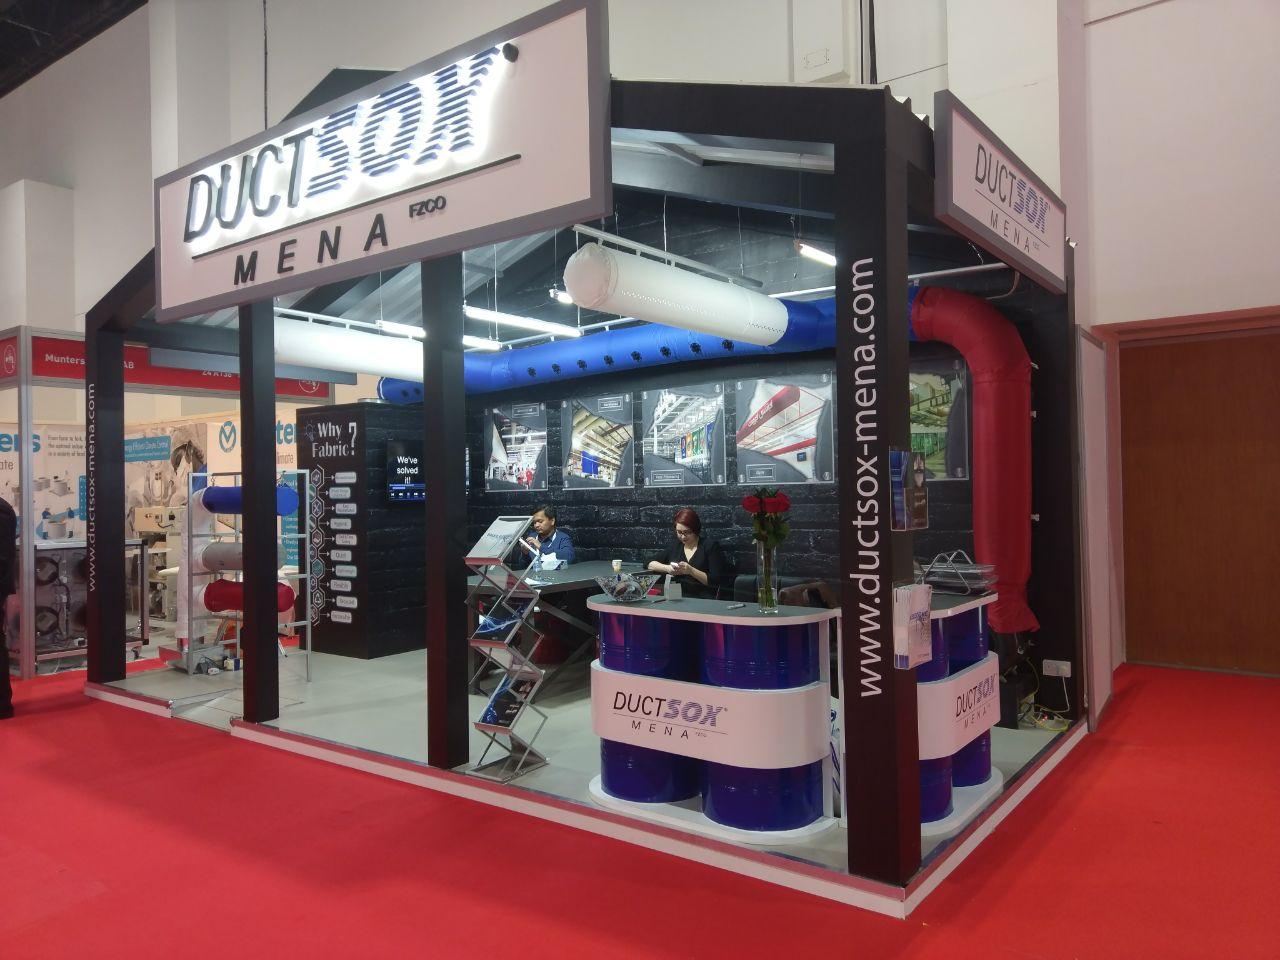 DuctSox-MENA | Home